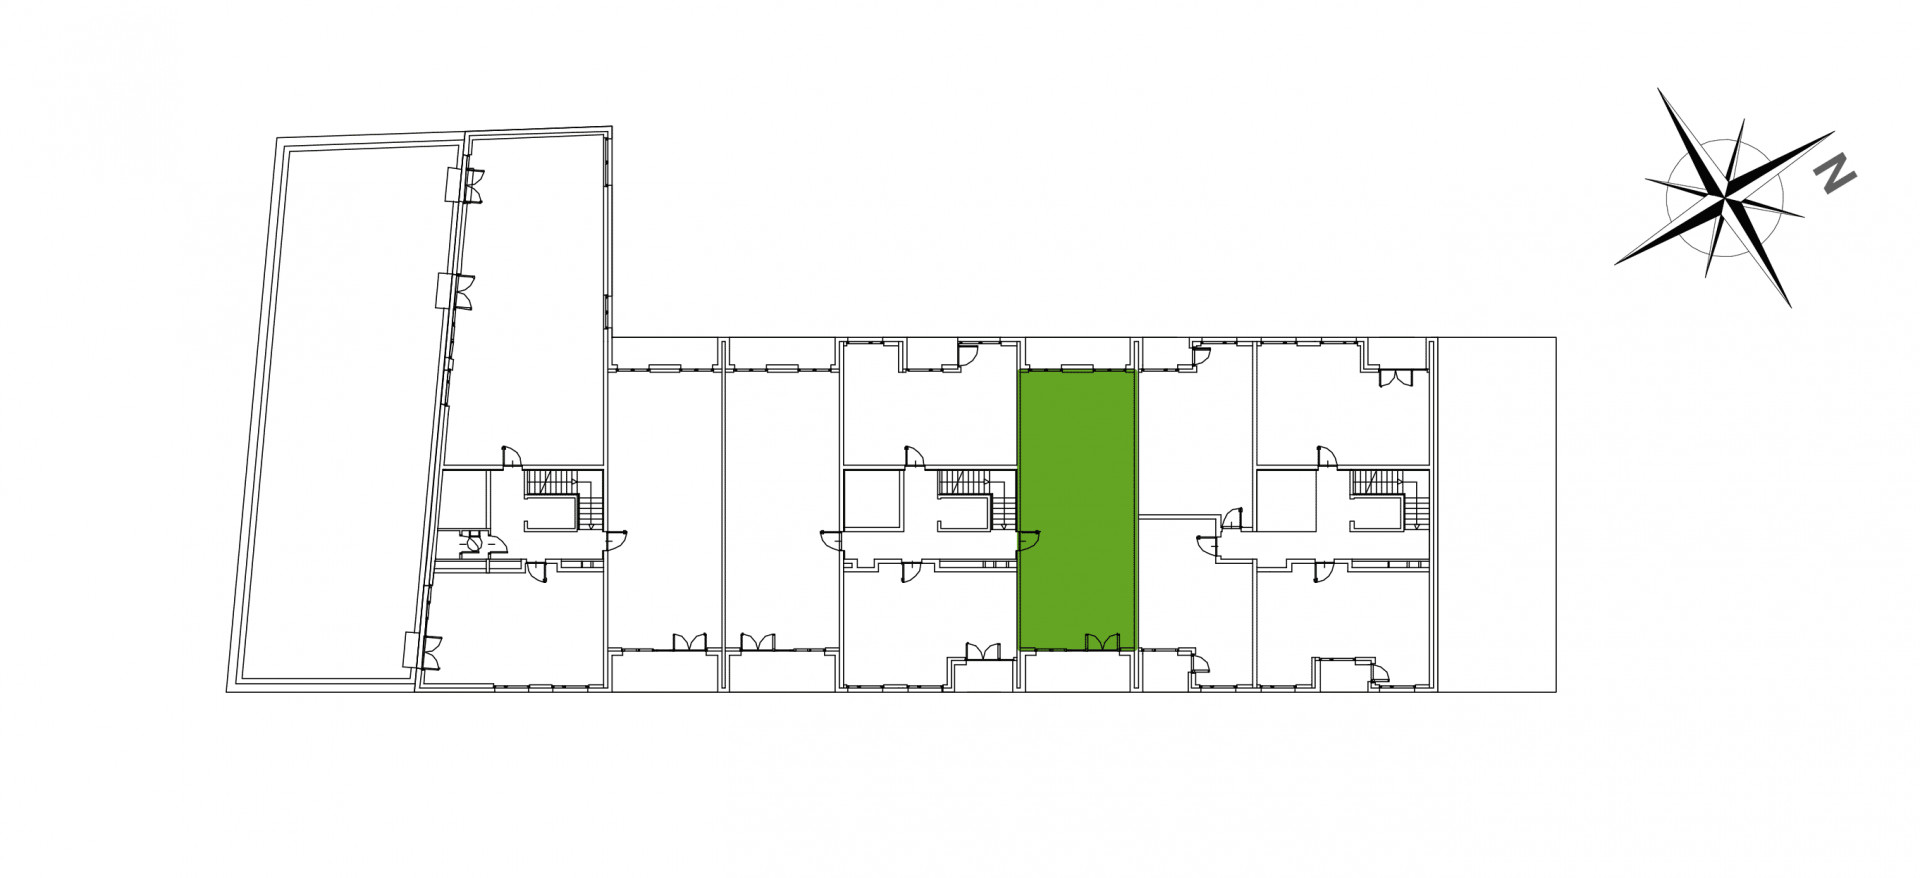 Mazowiecka 72 / apartament nr 42 rzut 2